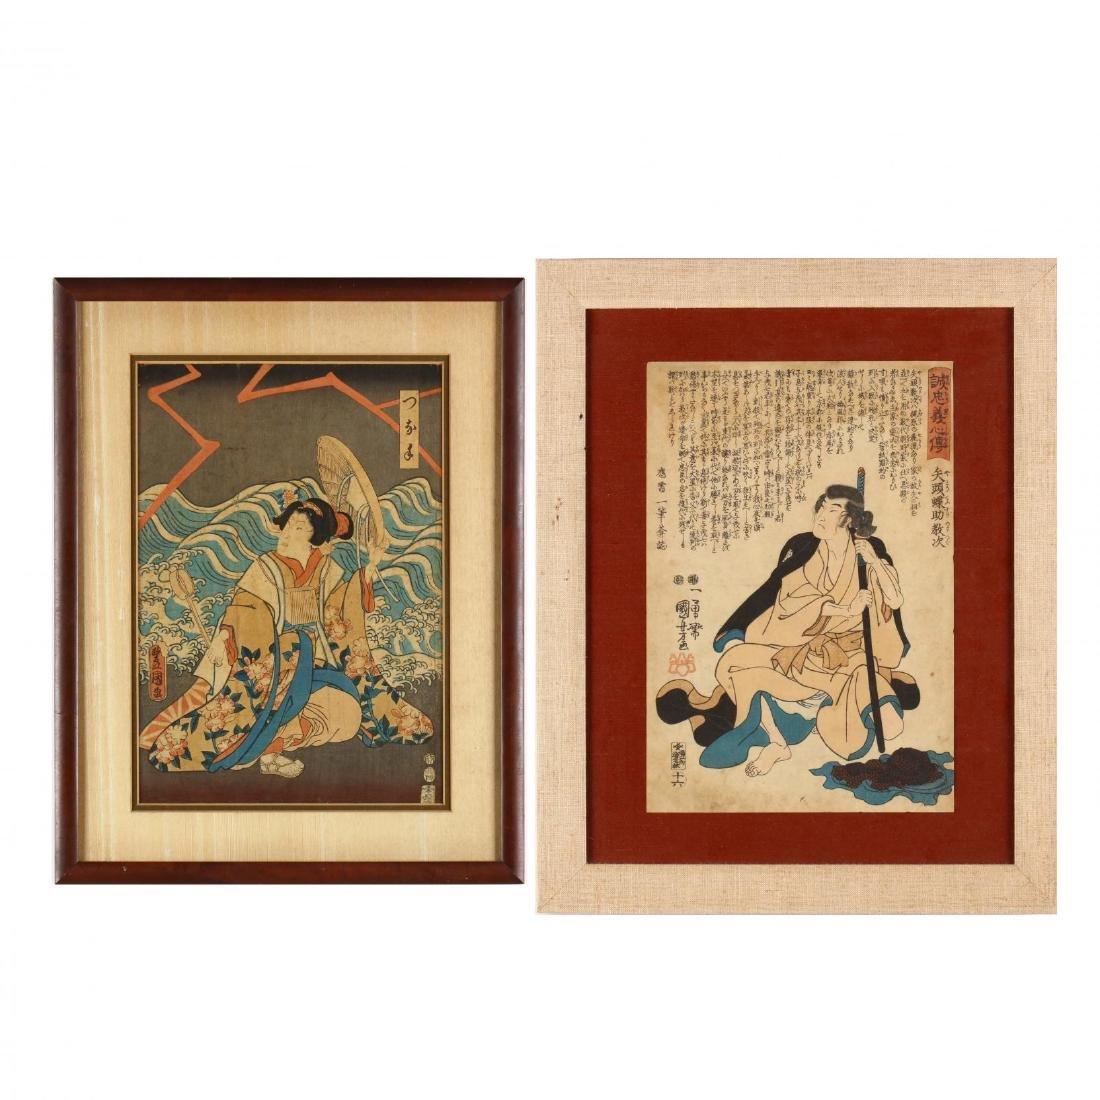 Two Japanese Woodblock Prints by Kunisada and Kuniyoshi